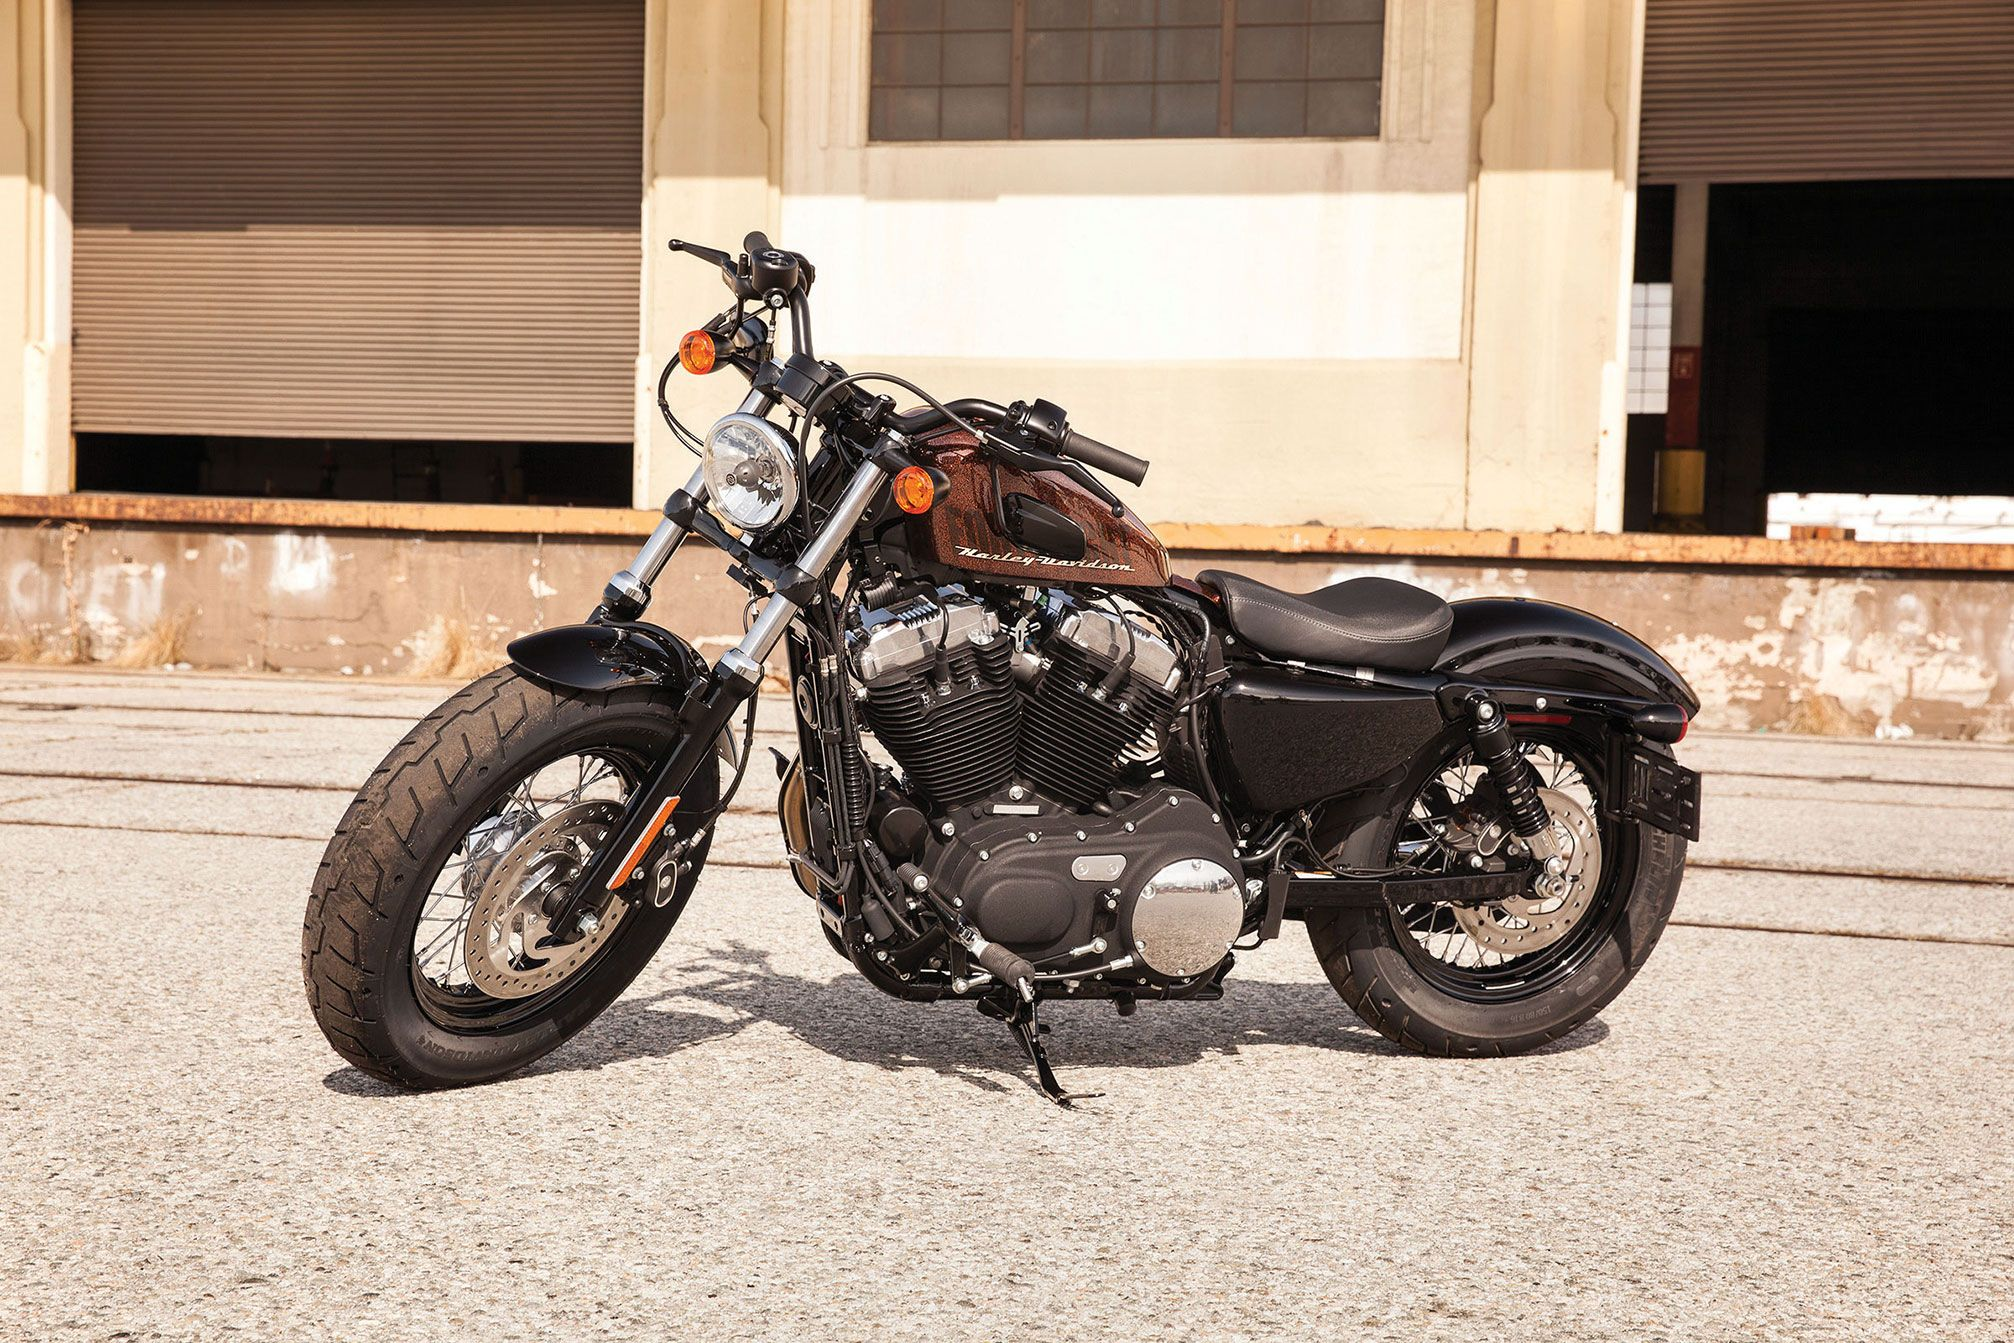 2014 Harley Davidson Xl1200x Forty Eight Review Harley Davidson Sportster Motocicletas Harley Davidson Harley Davidson